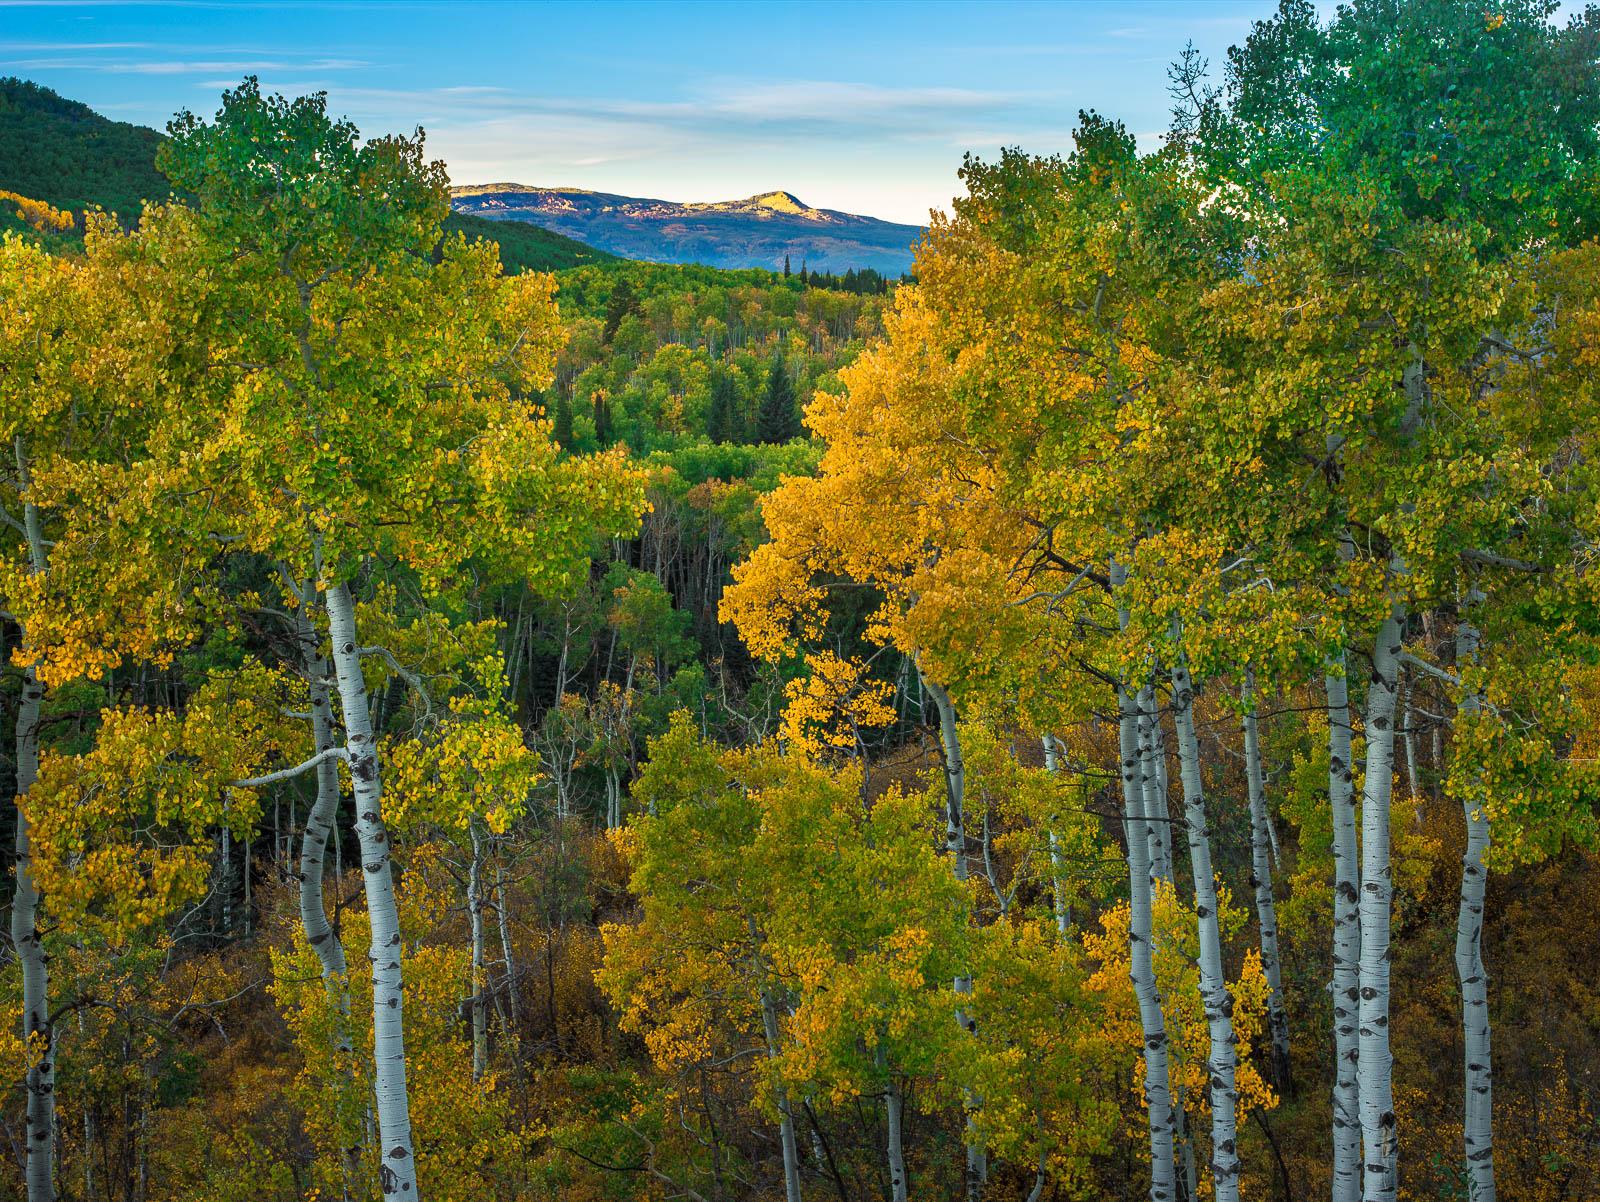 Aspen Grove,Aspen Grove,McClure Pass, Colorado,colors,summer,foliage, photo